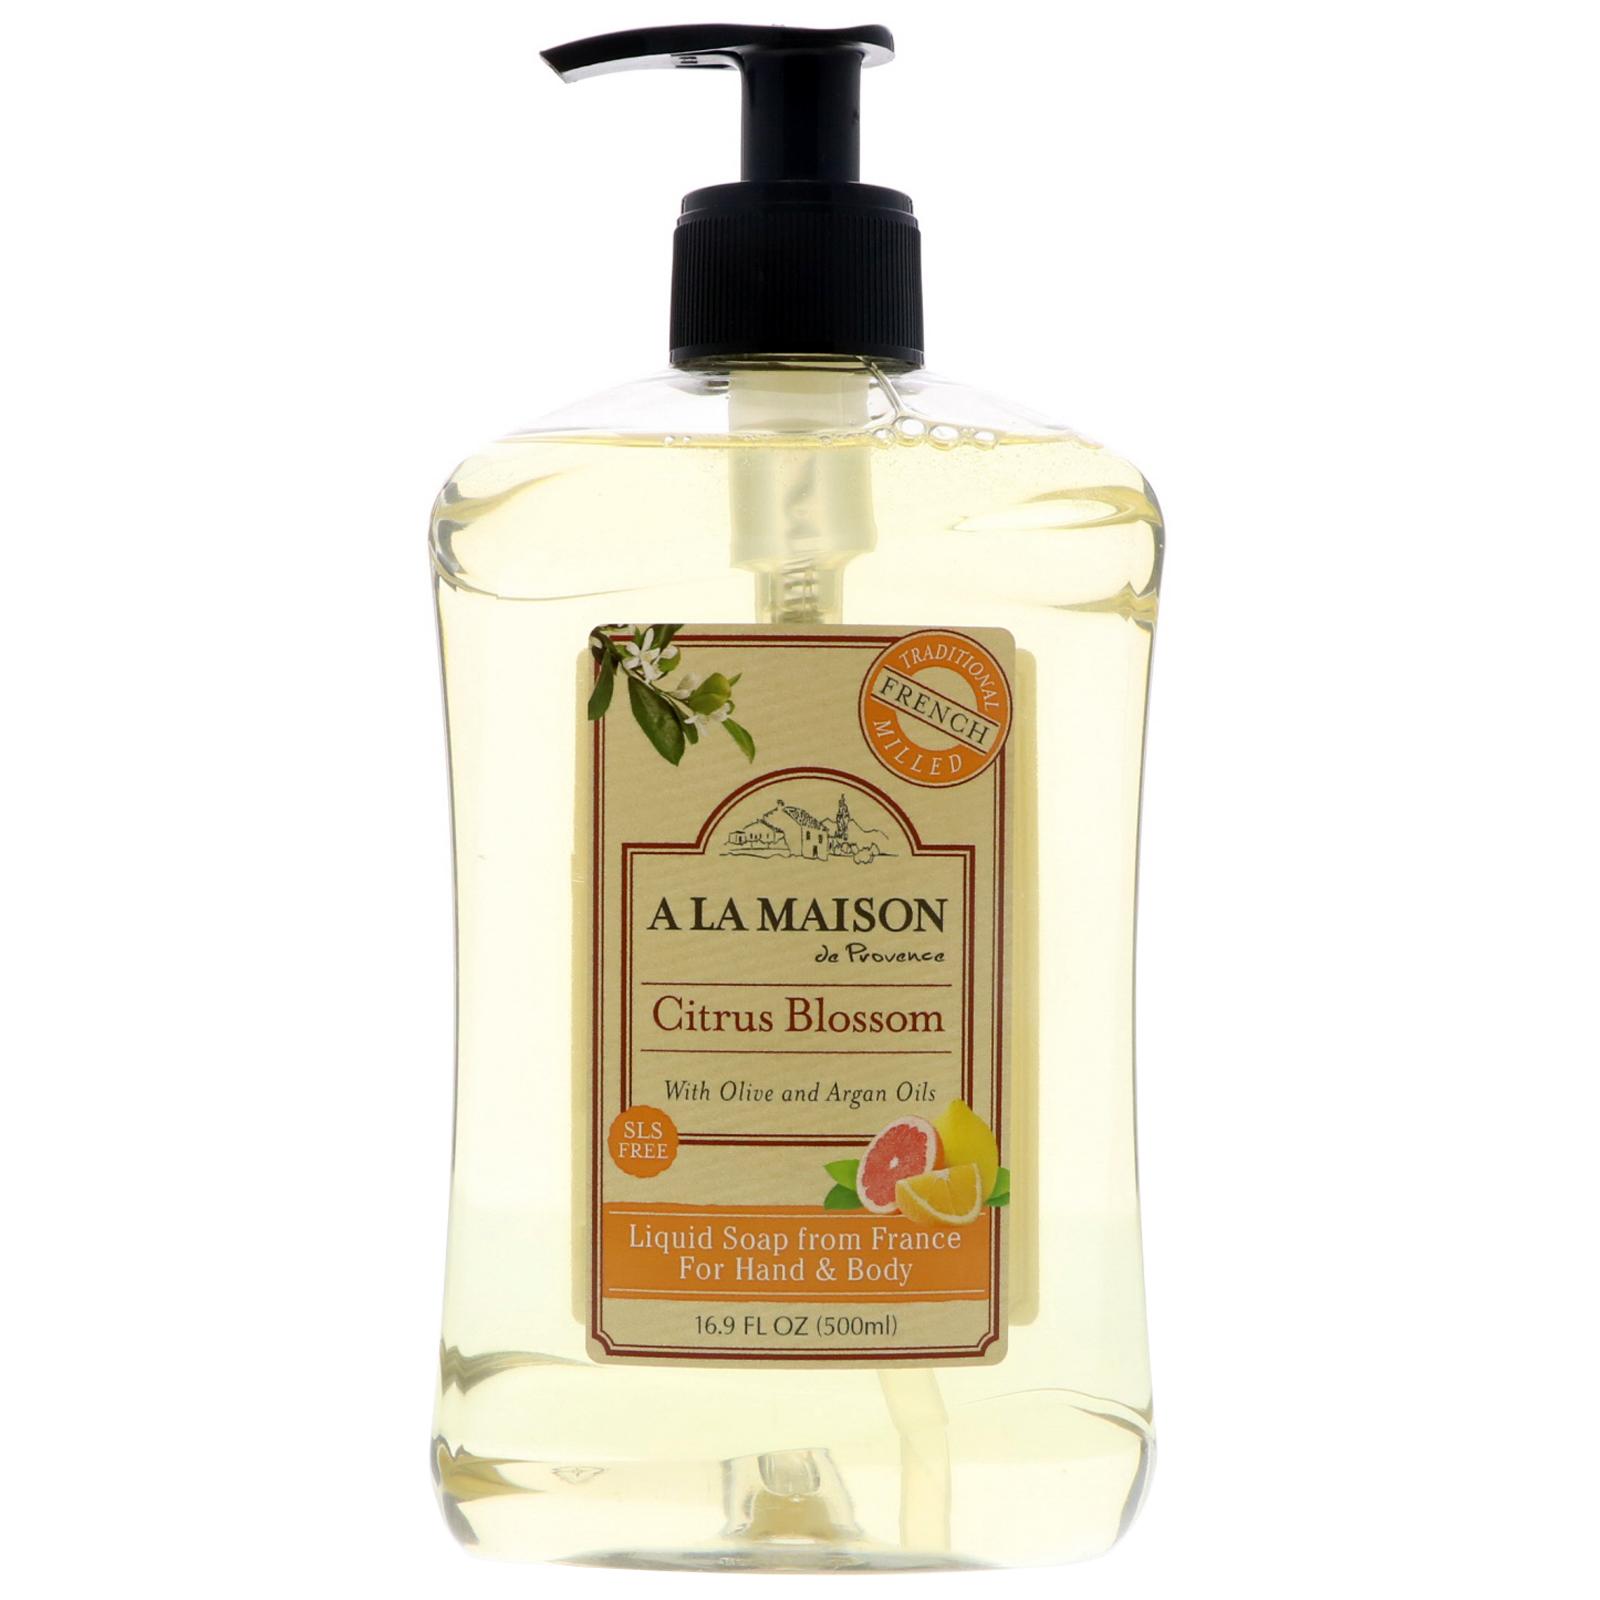 A La Maison de Provence, Hand & Body Liquid Soap, Citrus Blossom